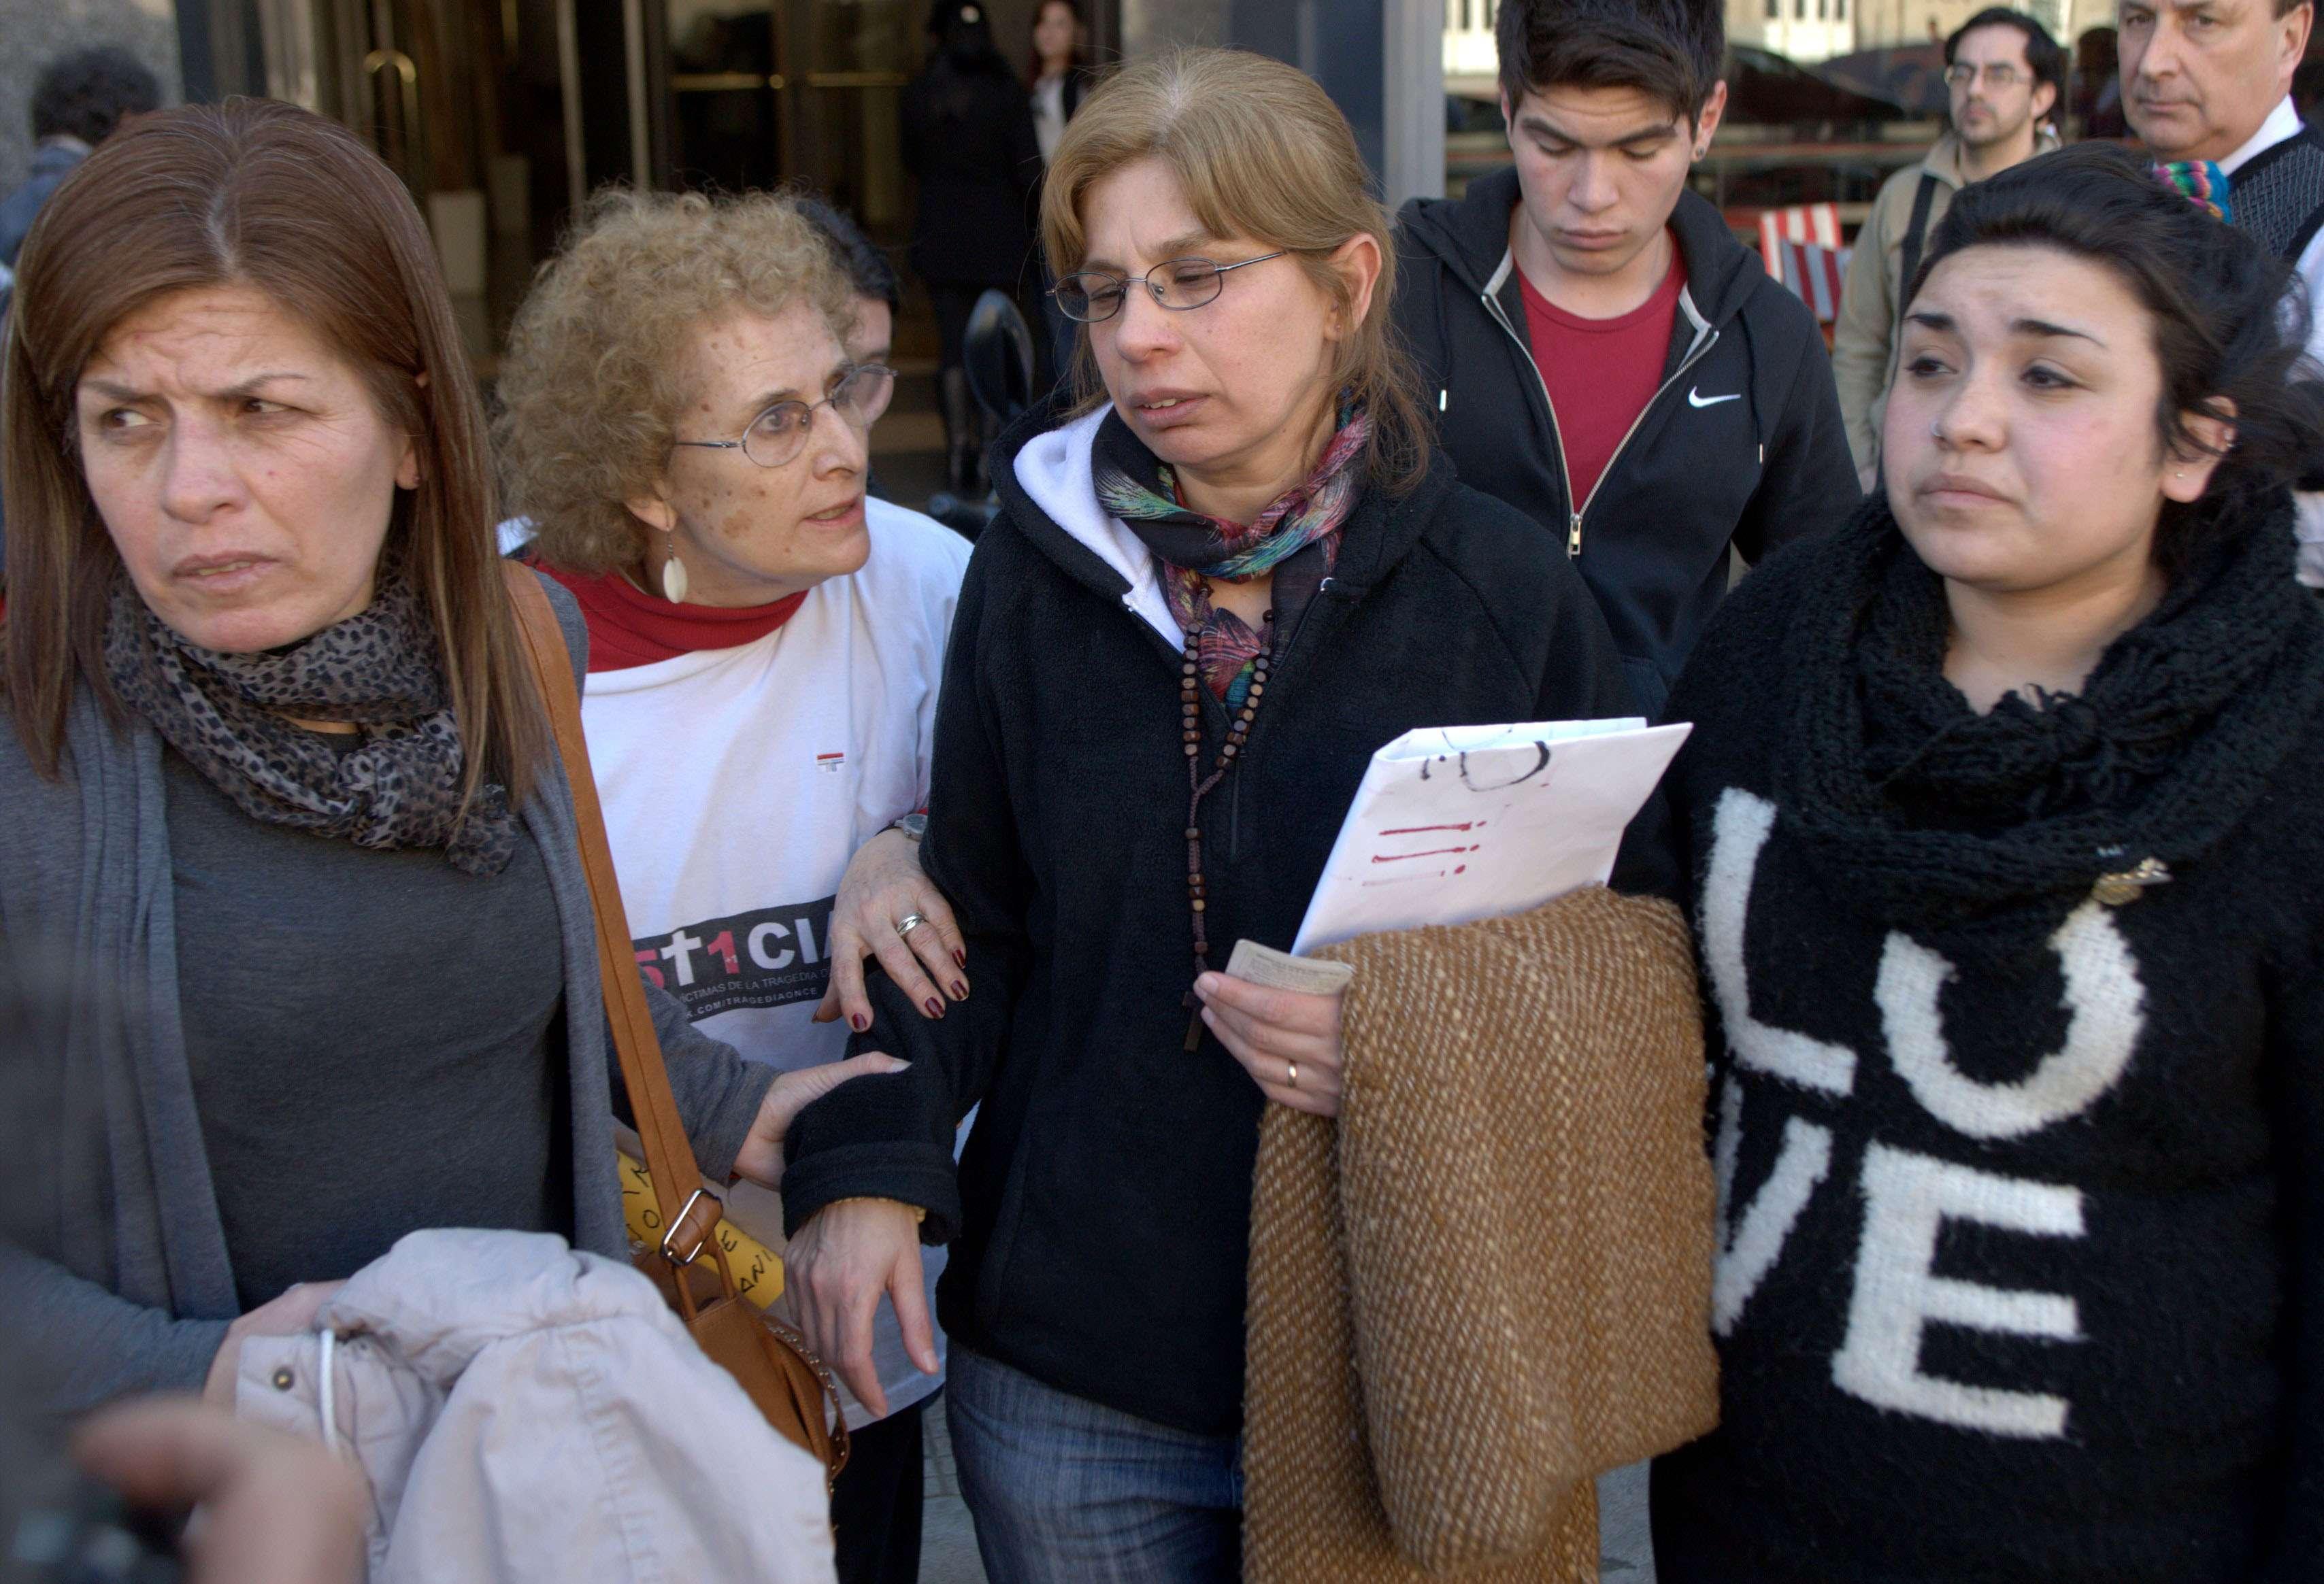 Crimen de Ángeles Rawson: declara la mujer de Mangeri Foto: NA